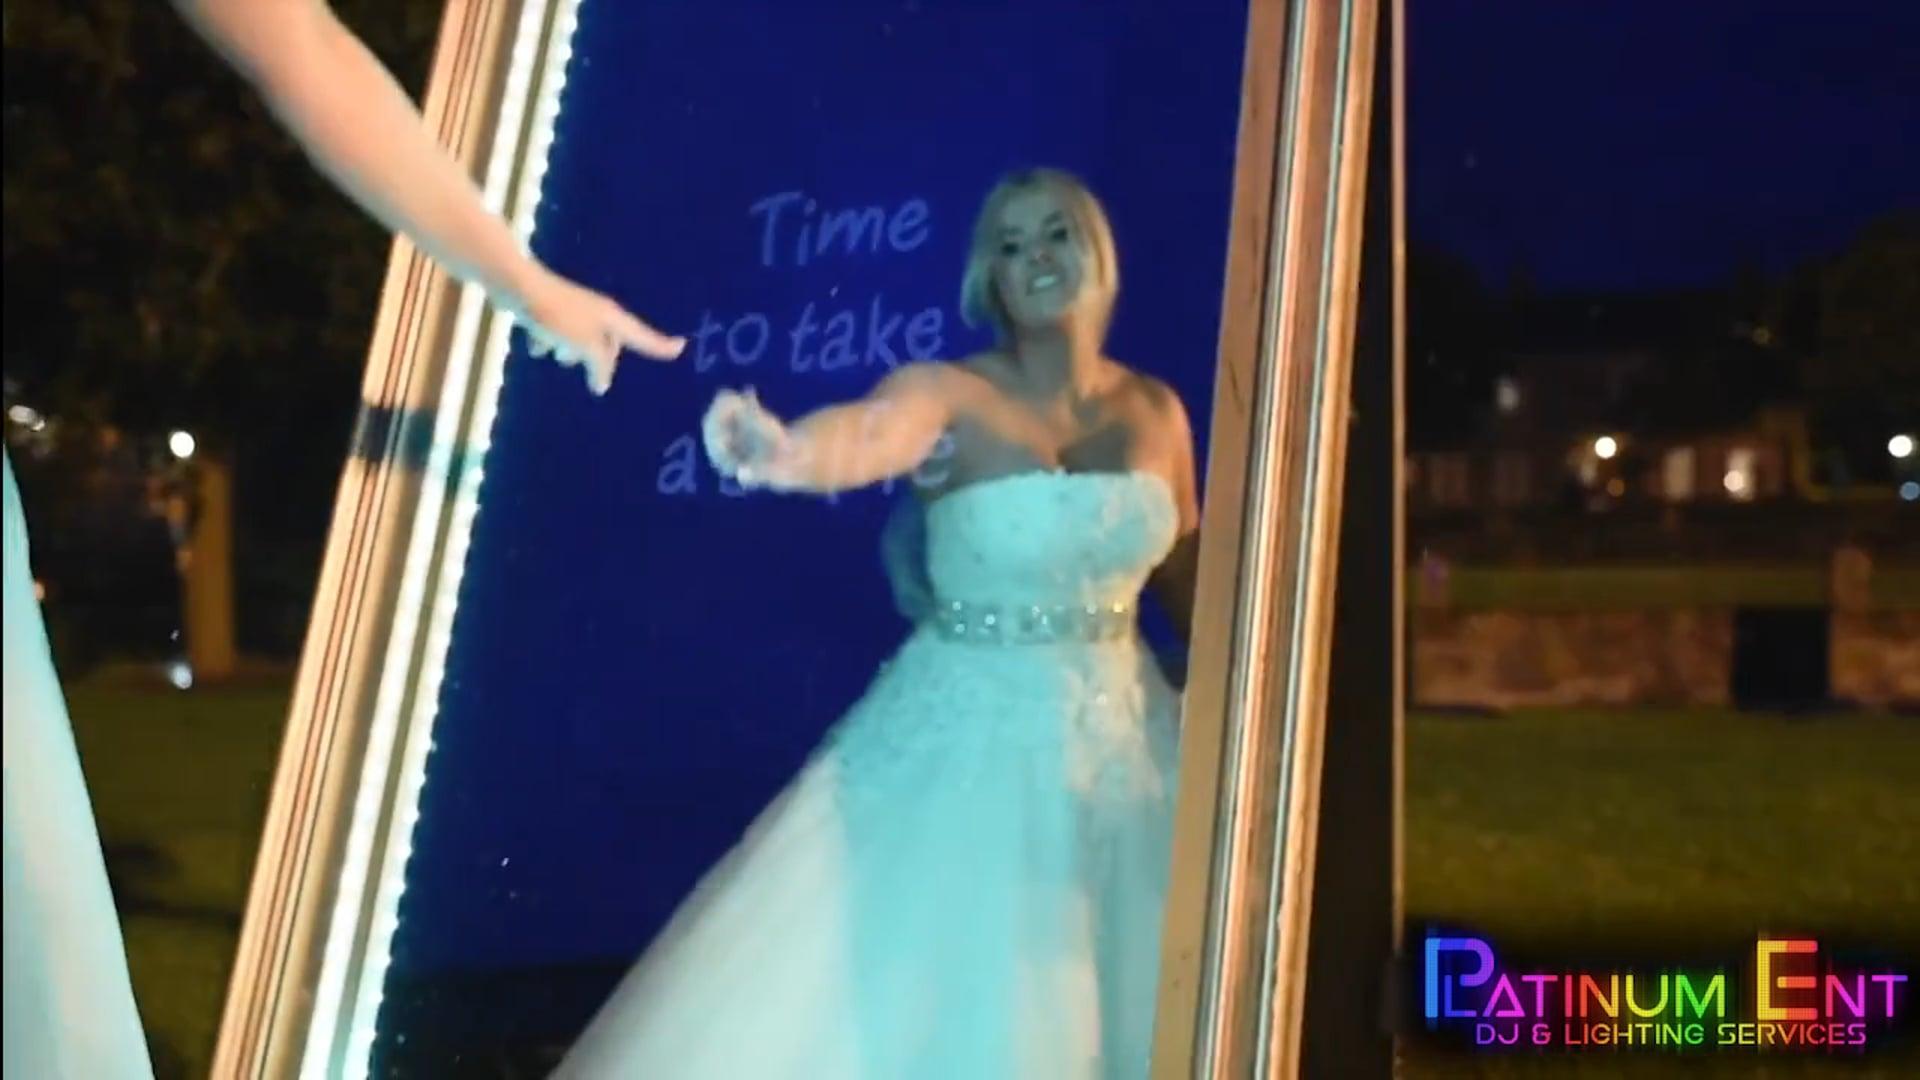 Platinum Ent  Mirror Photo Booth